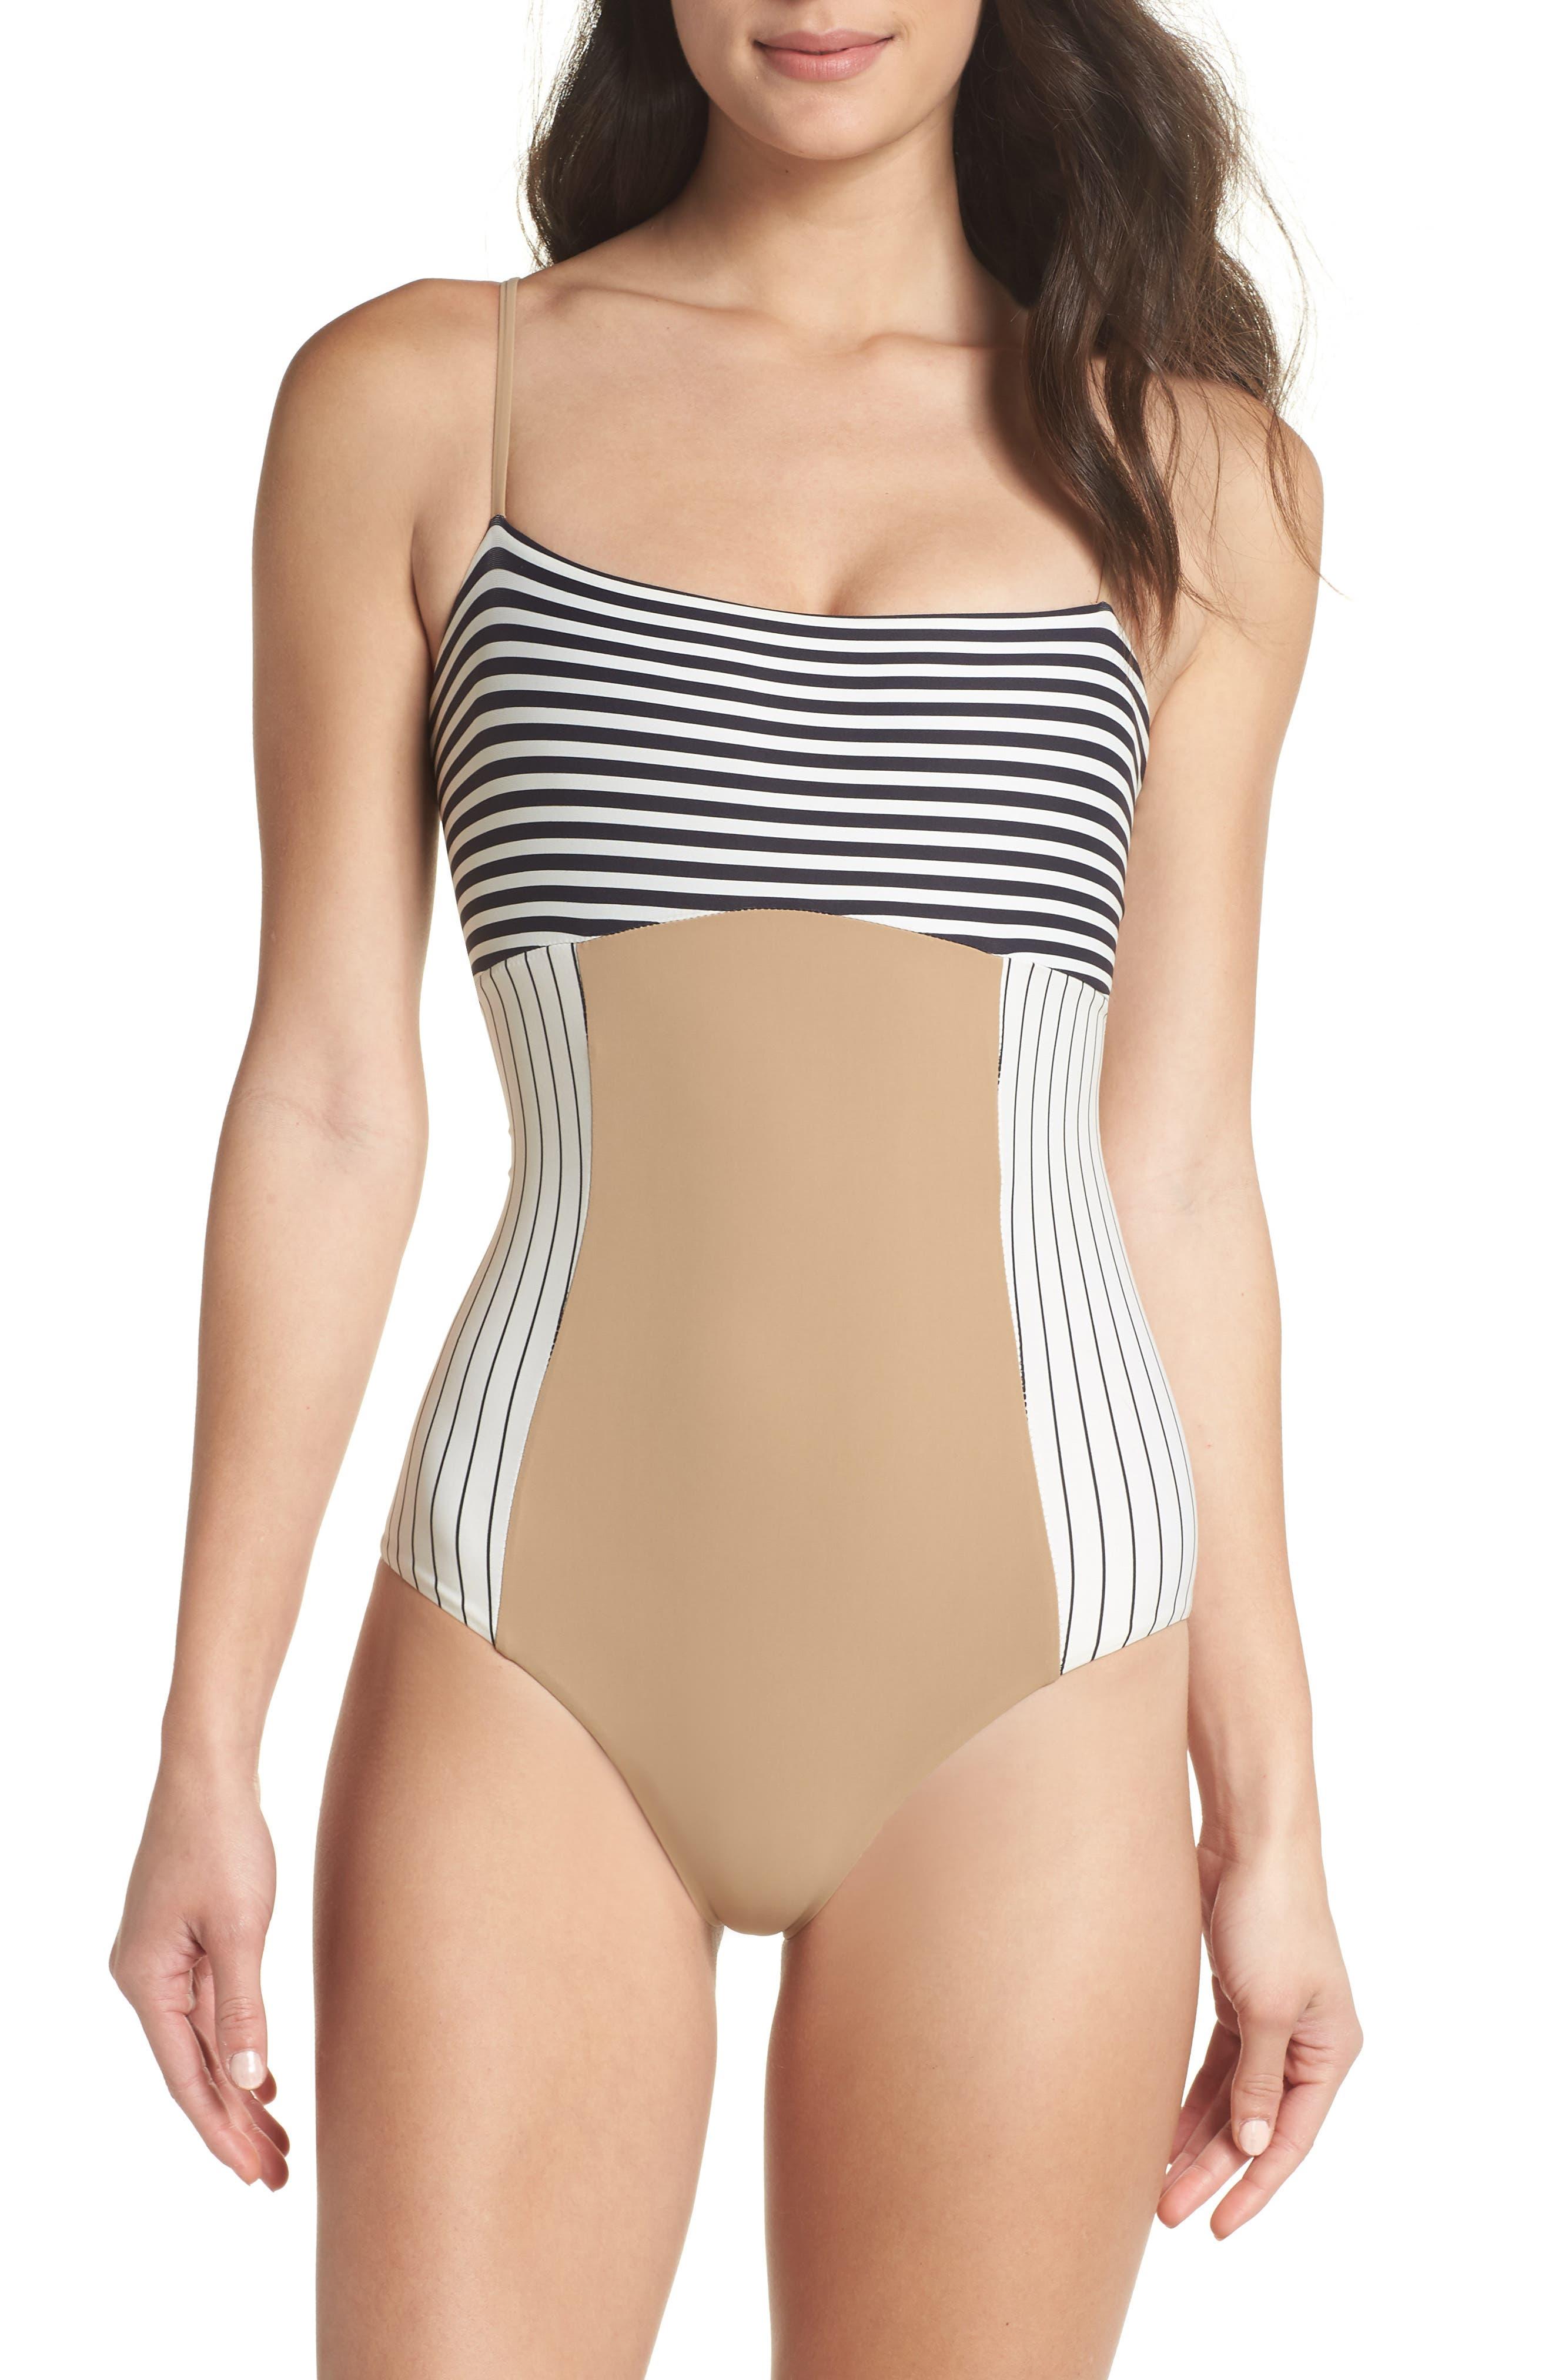 Finn One-Piece Swimsuit,                         Main,                         color, 250